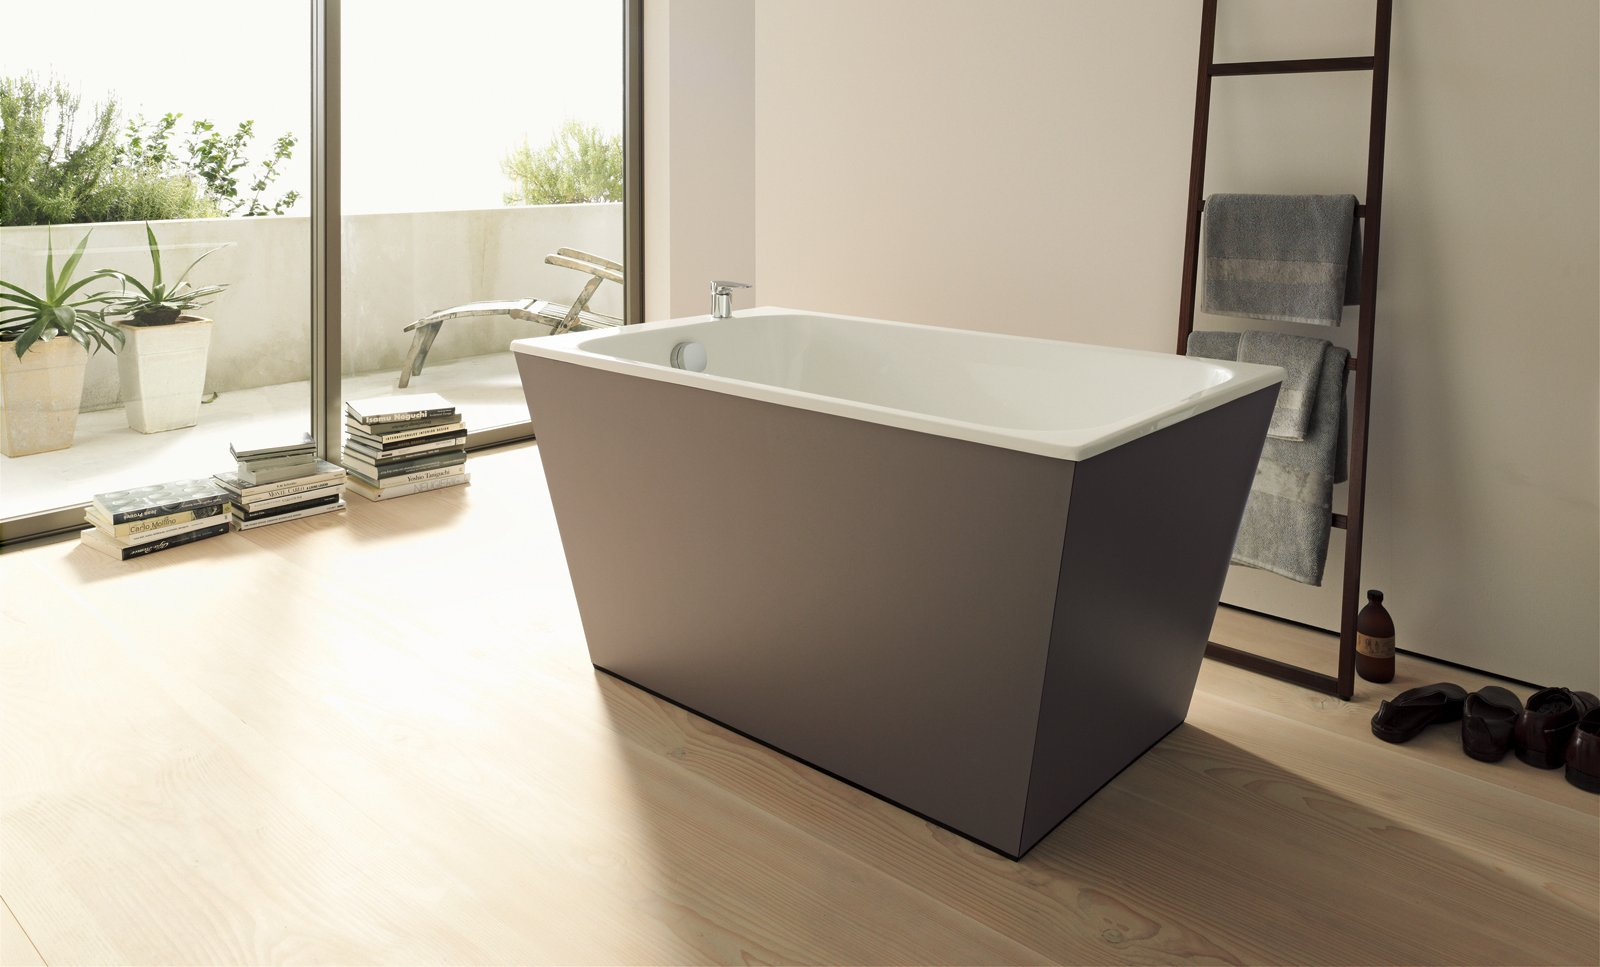 Vasche Da Bagno Di Piccole Dimensioni : Vasche da bagno piccole cose di casa